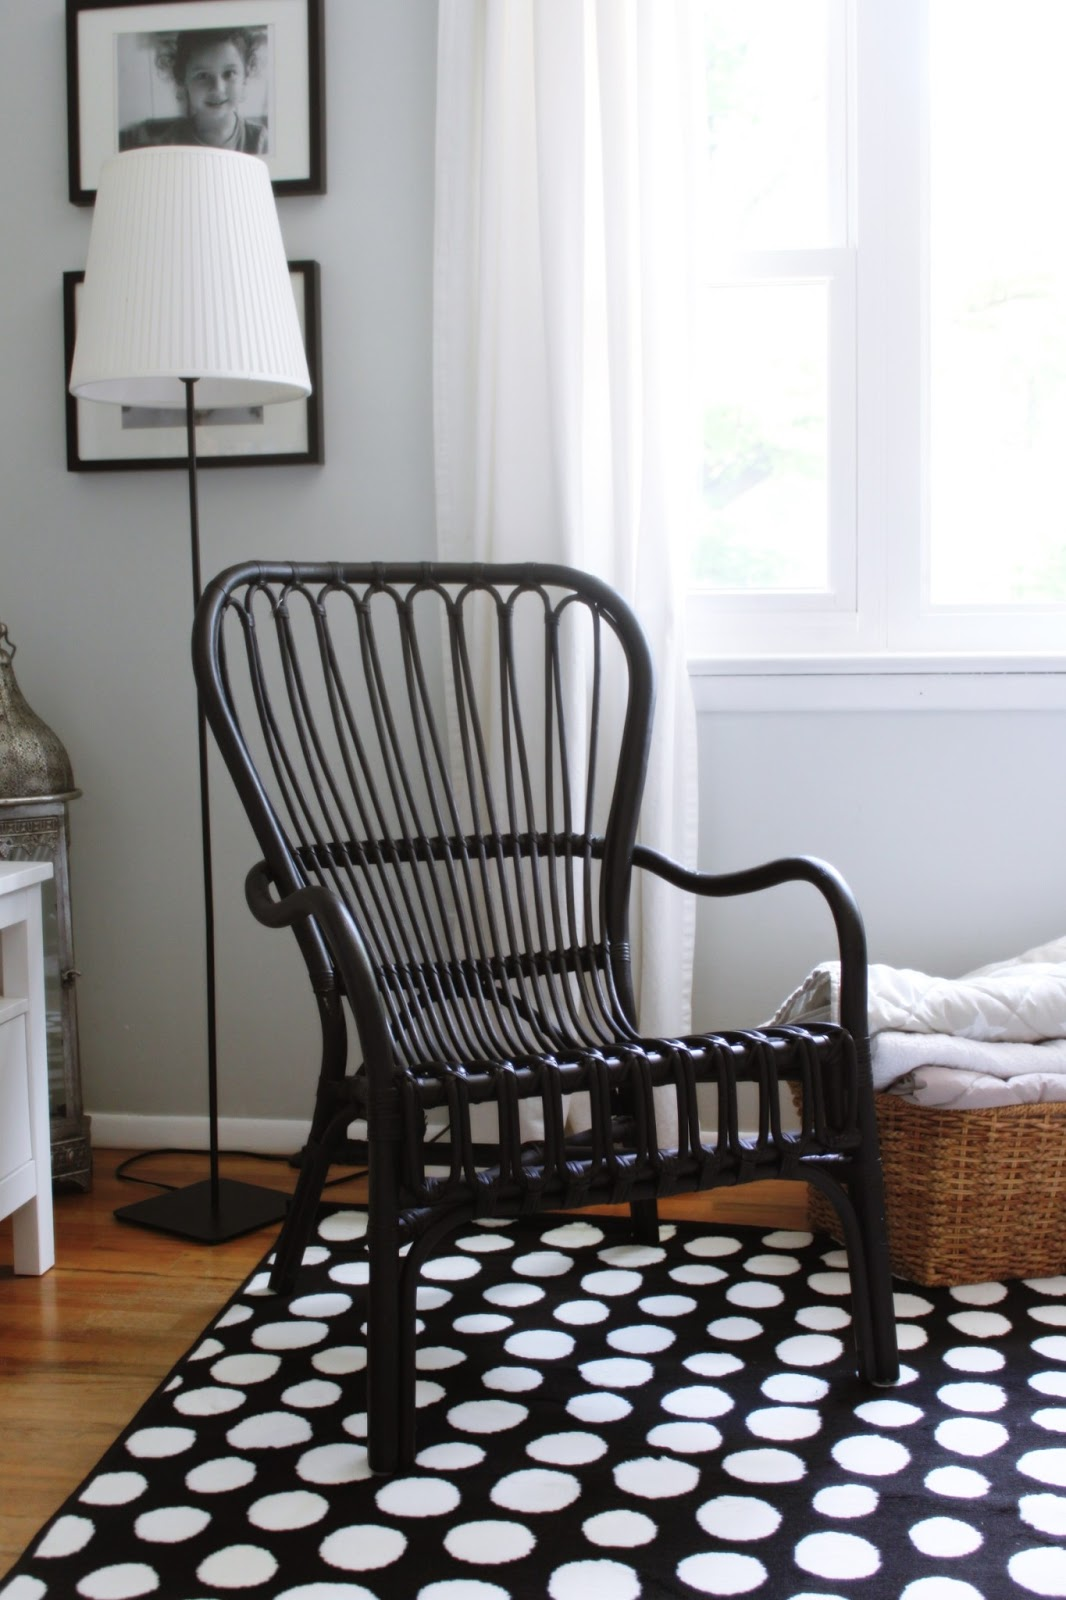 Rattan Chair Ikea Overstuffed And Ottoman Set House Of Danish Marie New